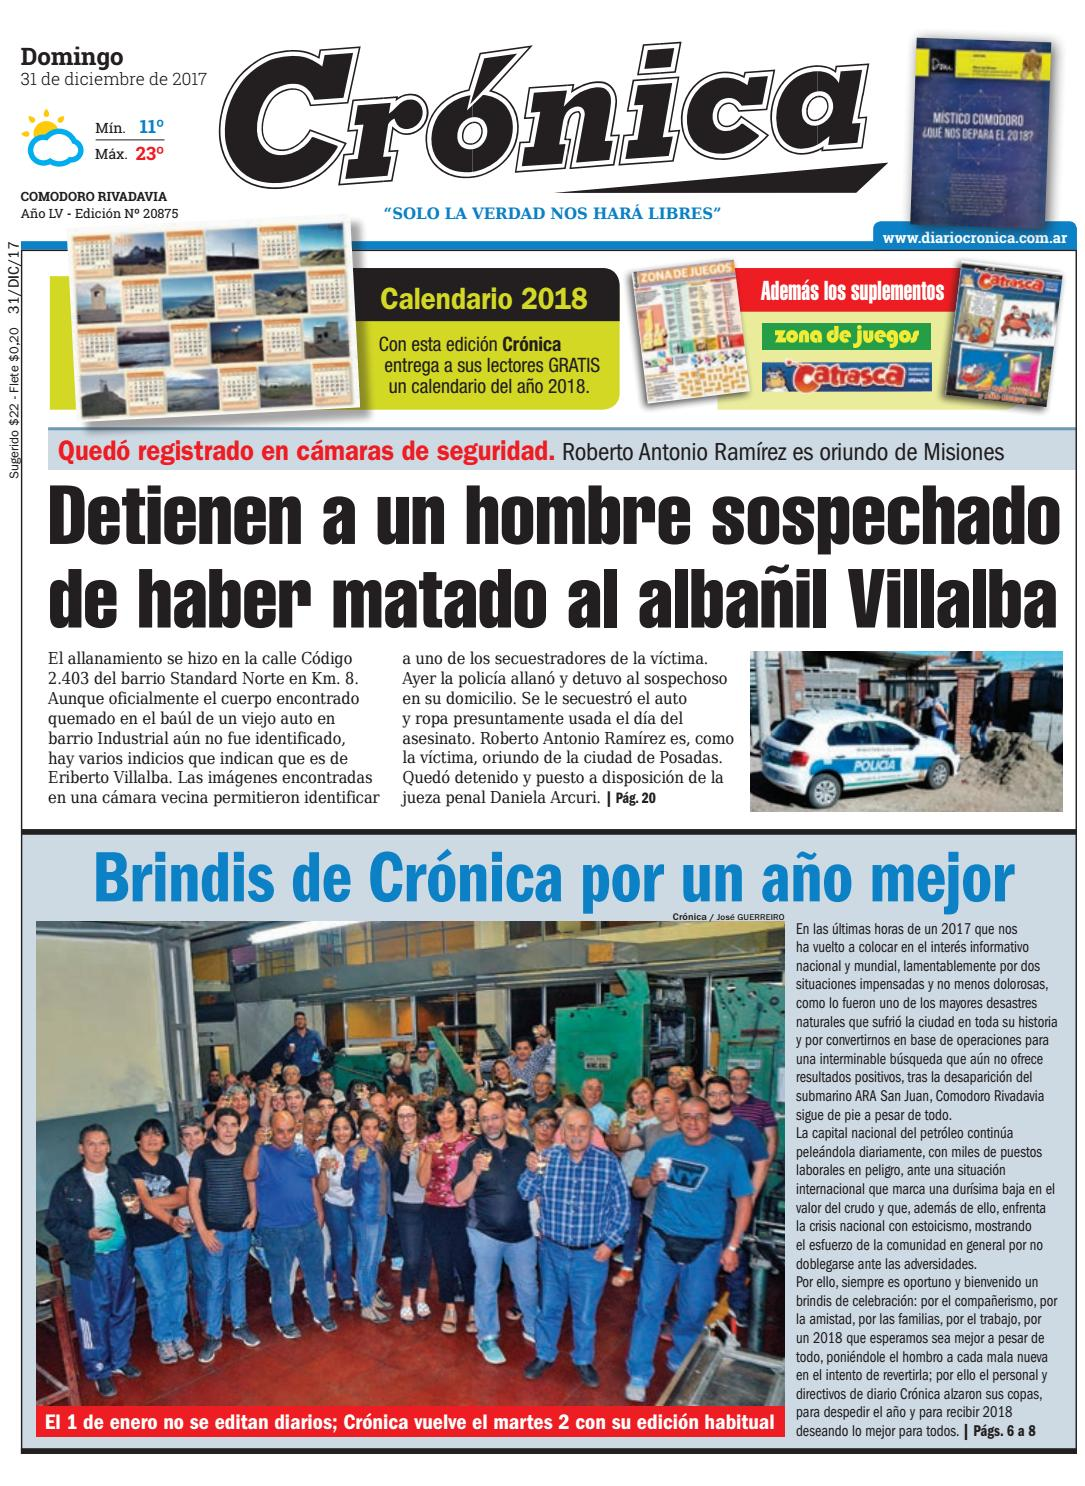 7b12acc617d01a4f15693690dafe3b9c by Diario Crónica - issuu cc2d93deff410